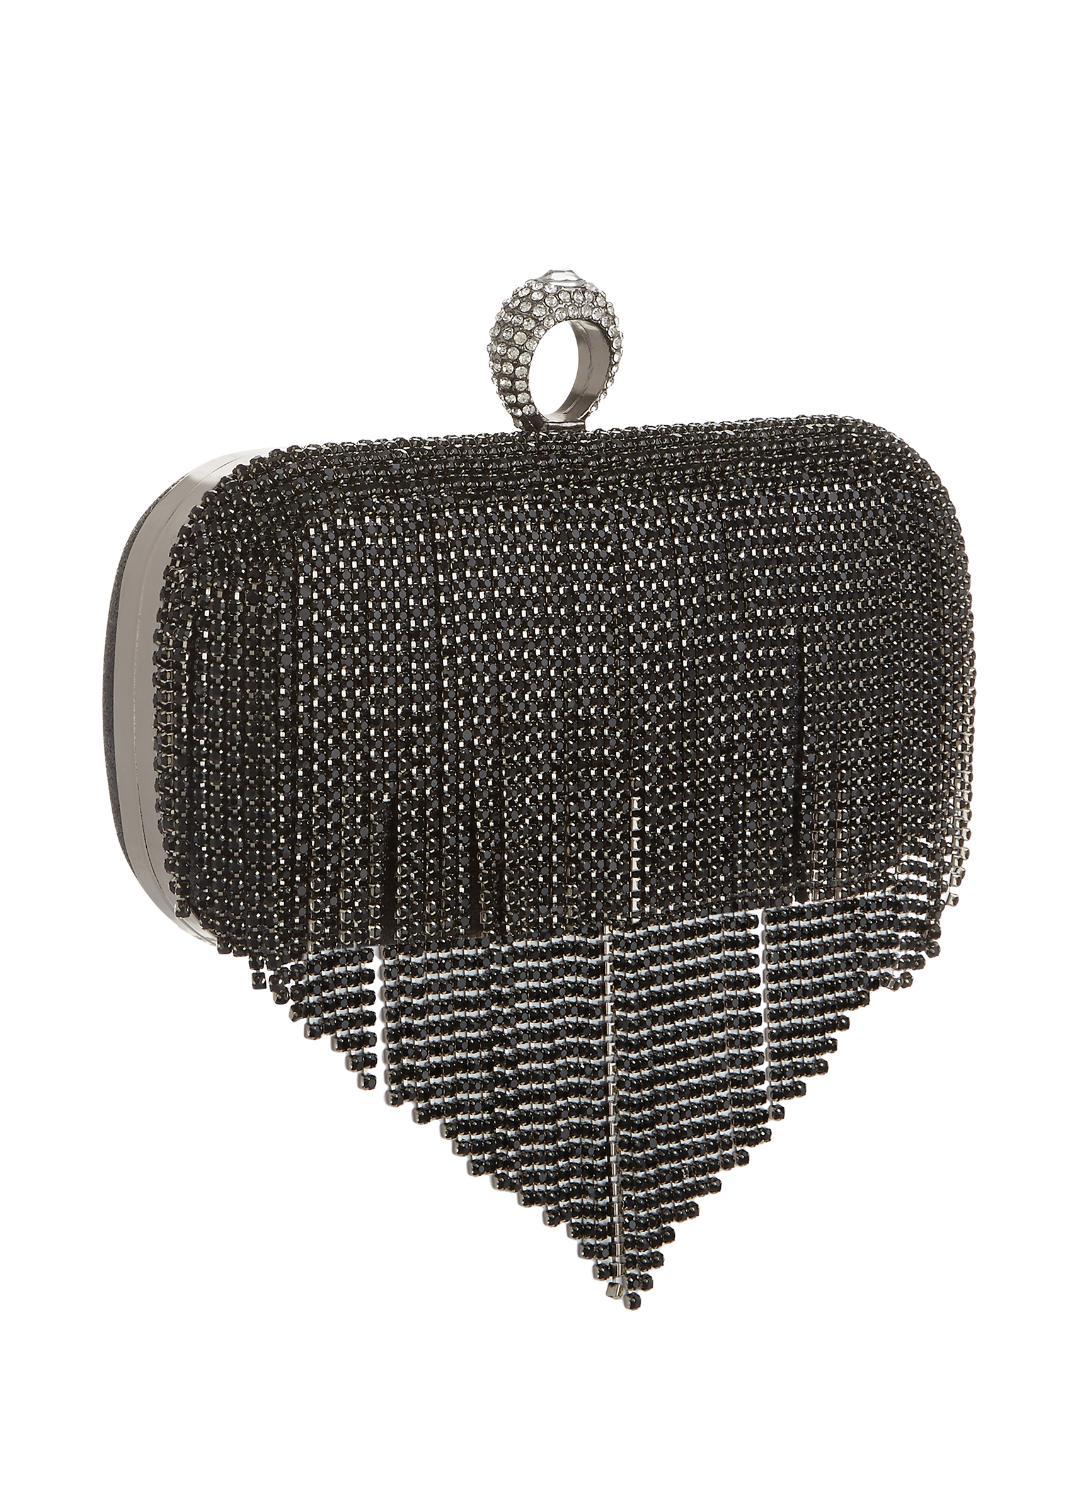 Mascara Black Waterfall Clutch Bag 1